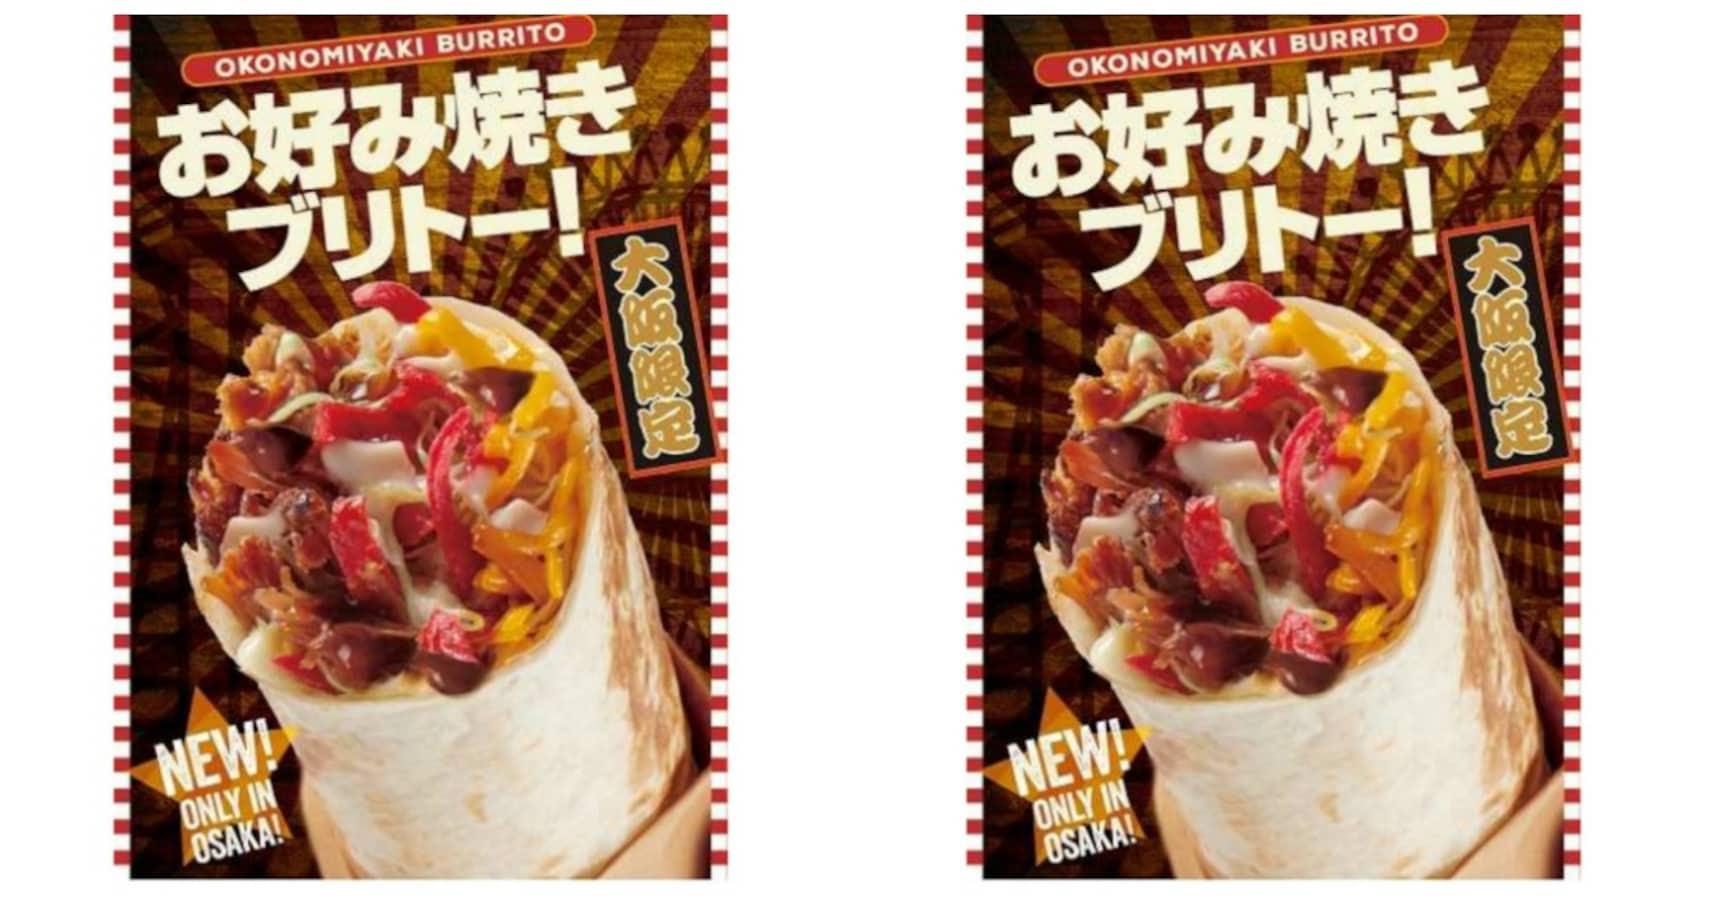 Okonomiyaki Burrito: Only in Osaka